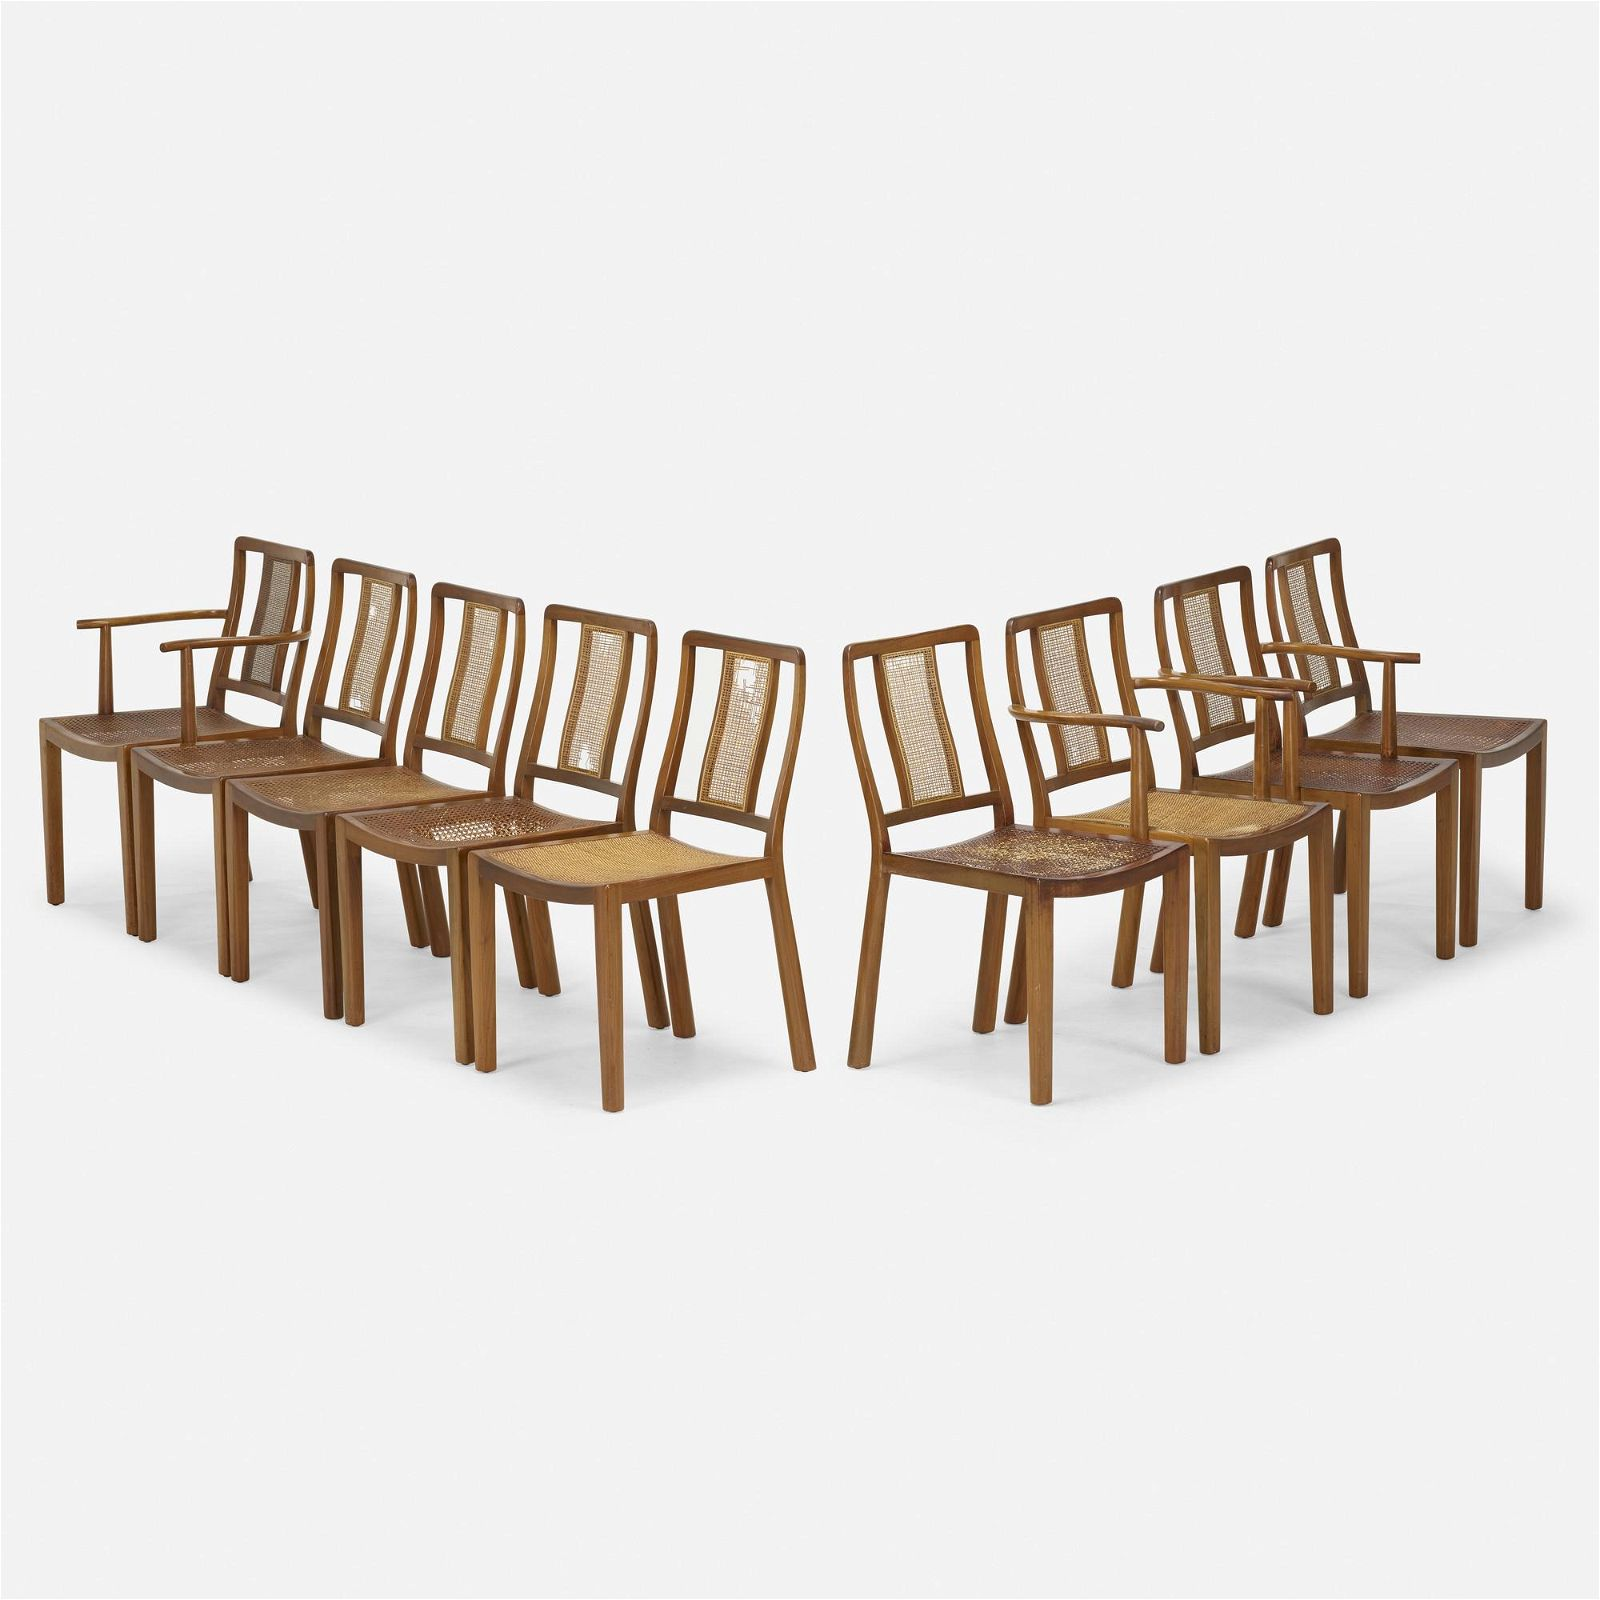 Edward Wormley, Dining chairs, set of nine